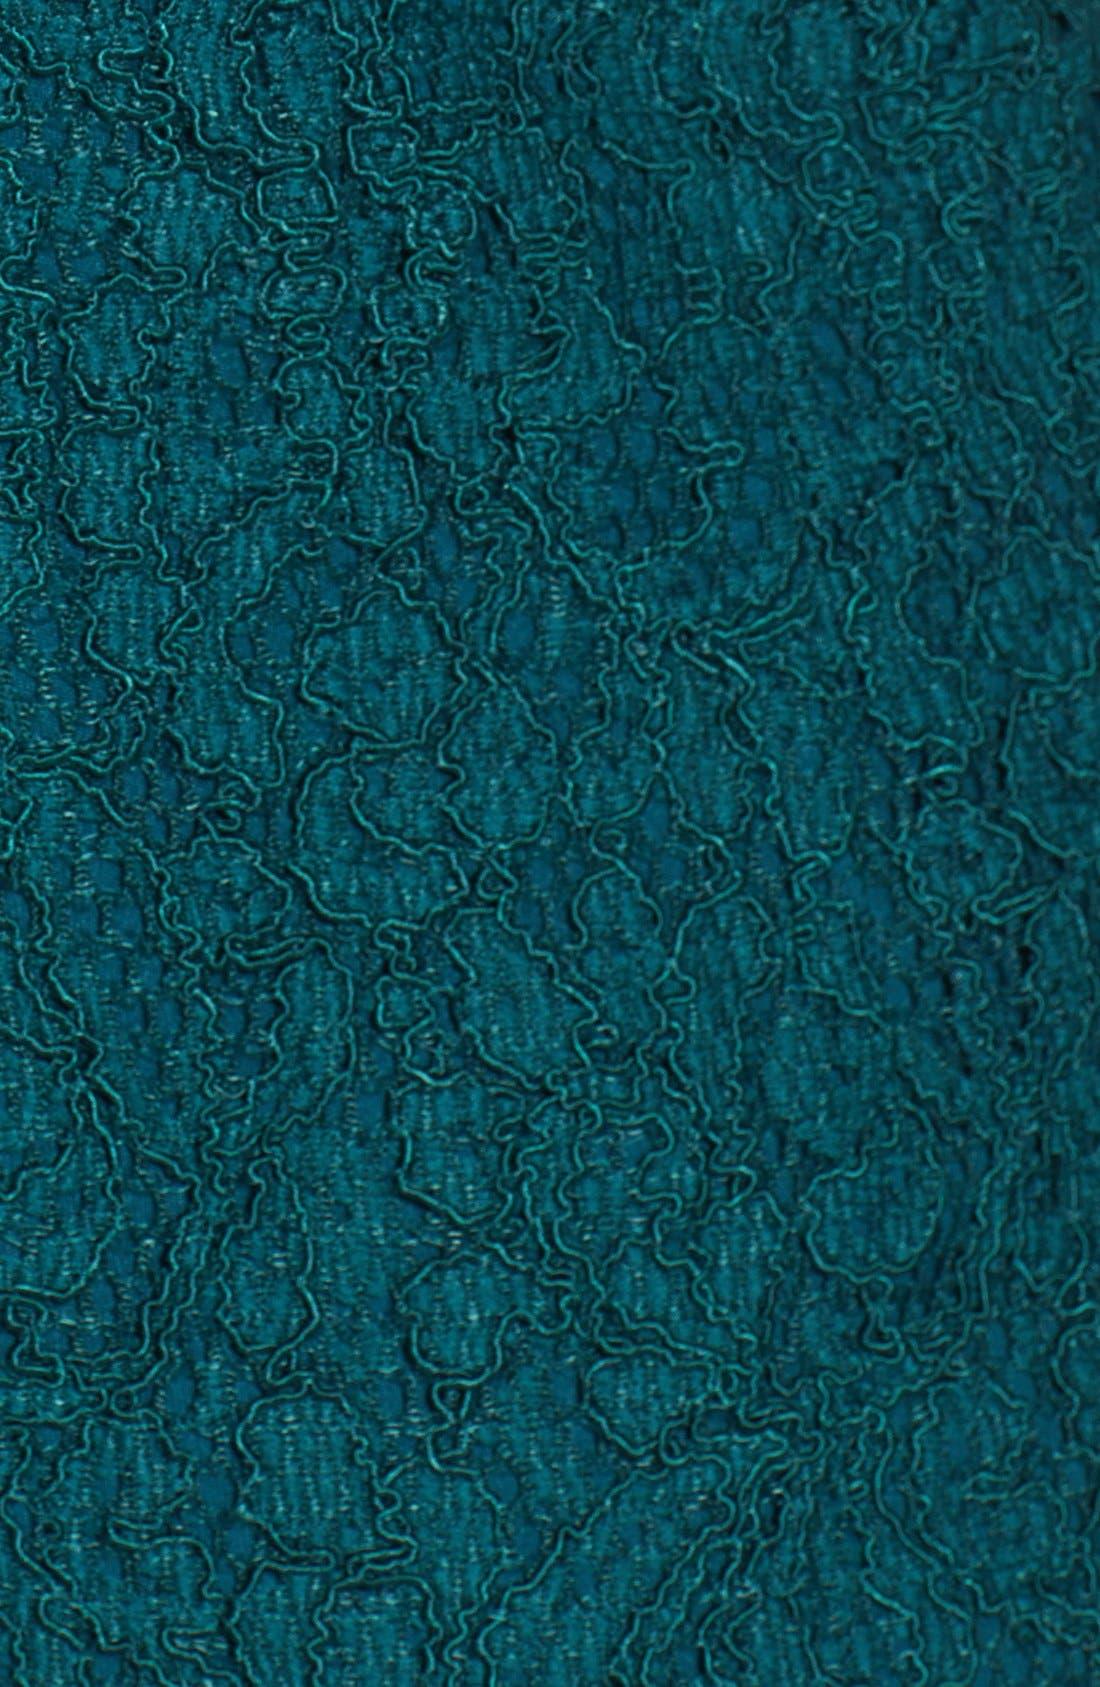 Boatneck Lace Sheath Dress,                             Alternate thumbnail 129, color,